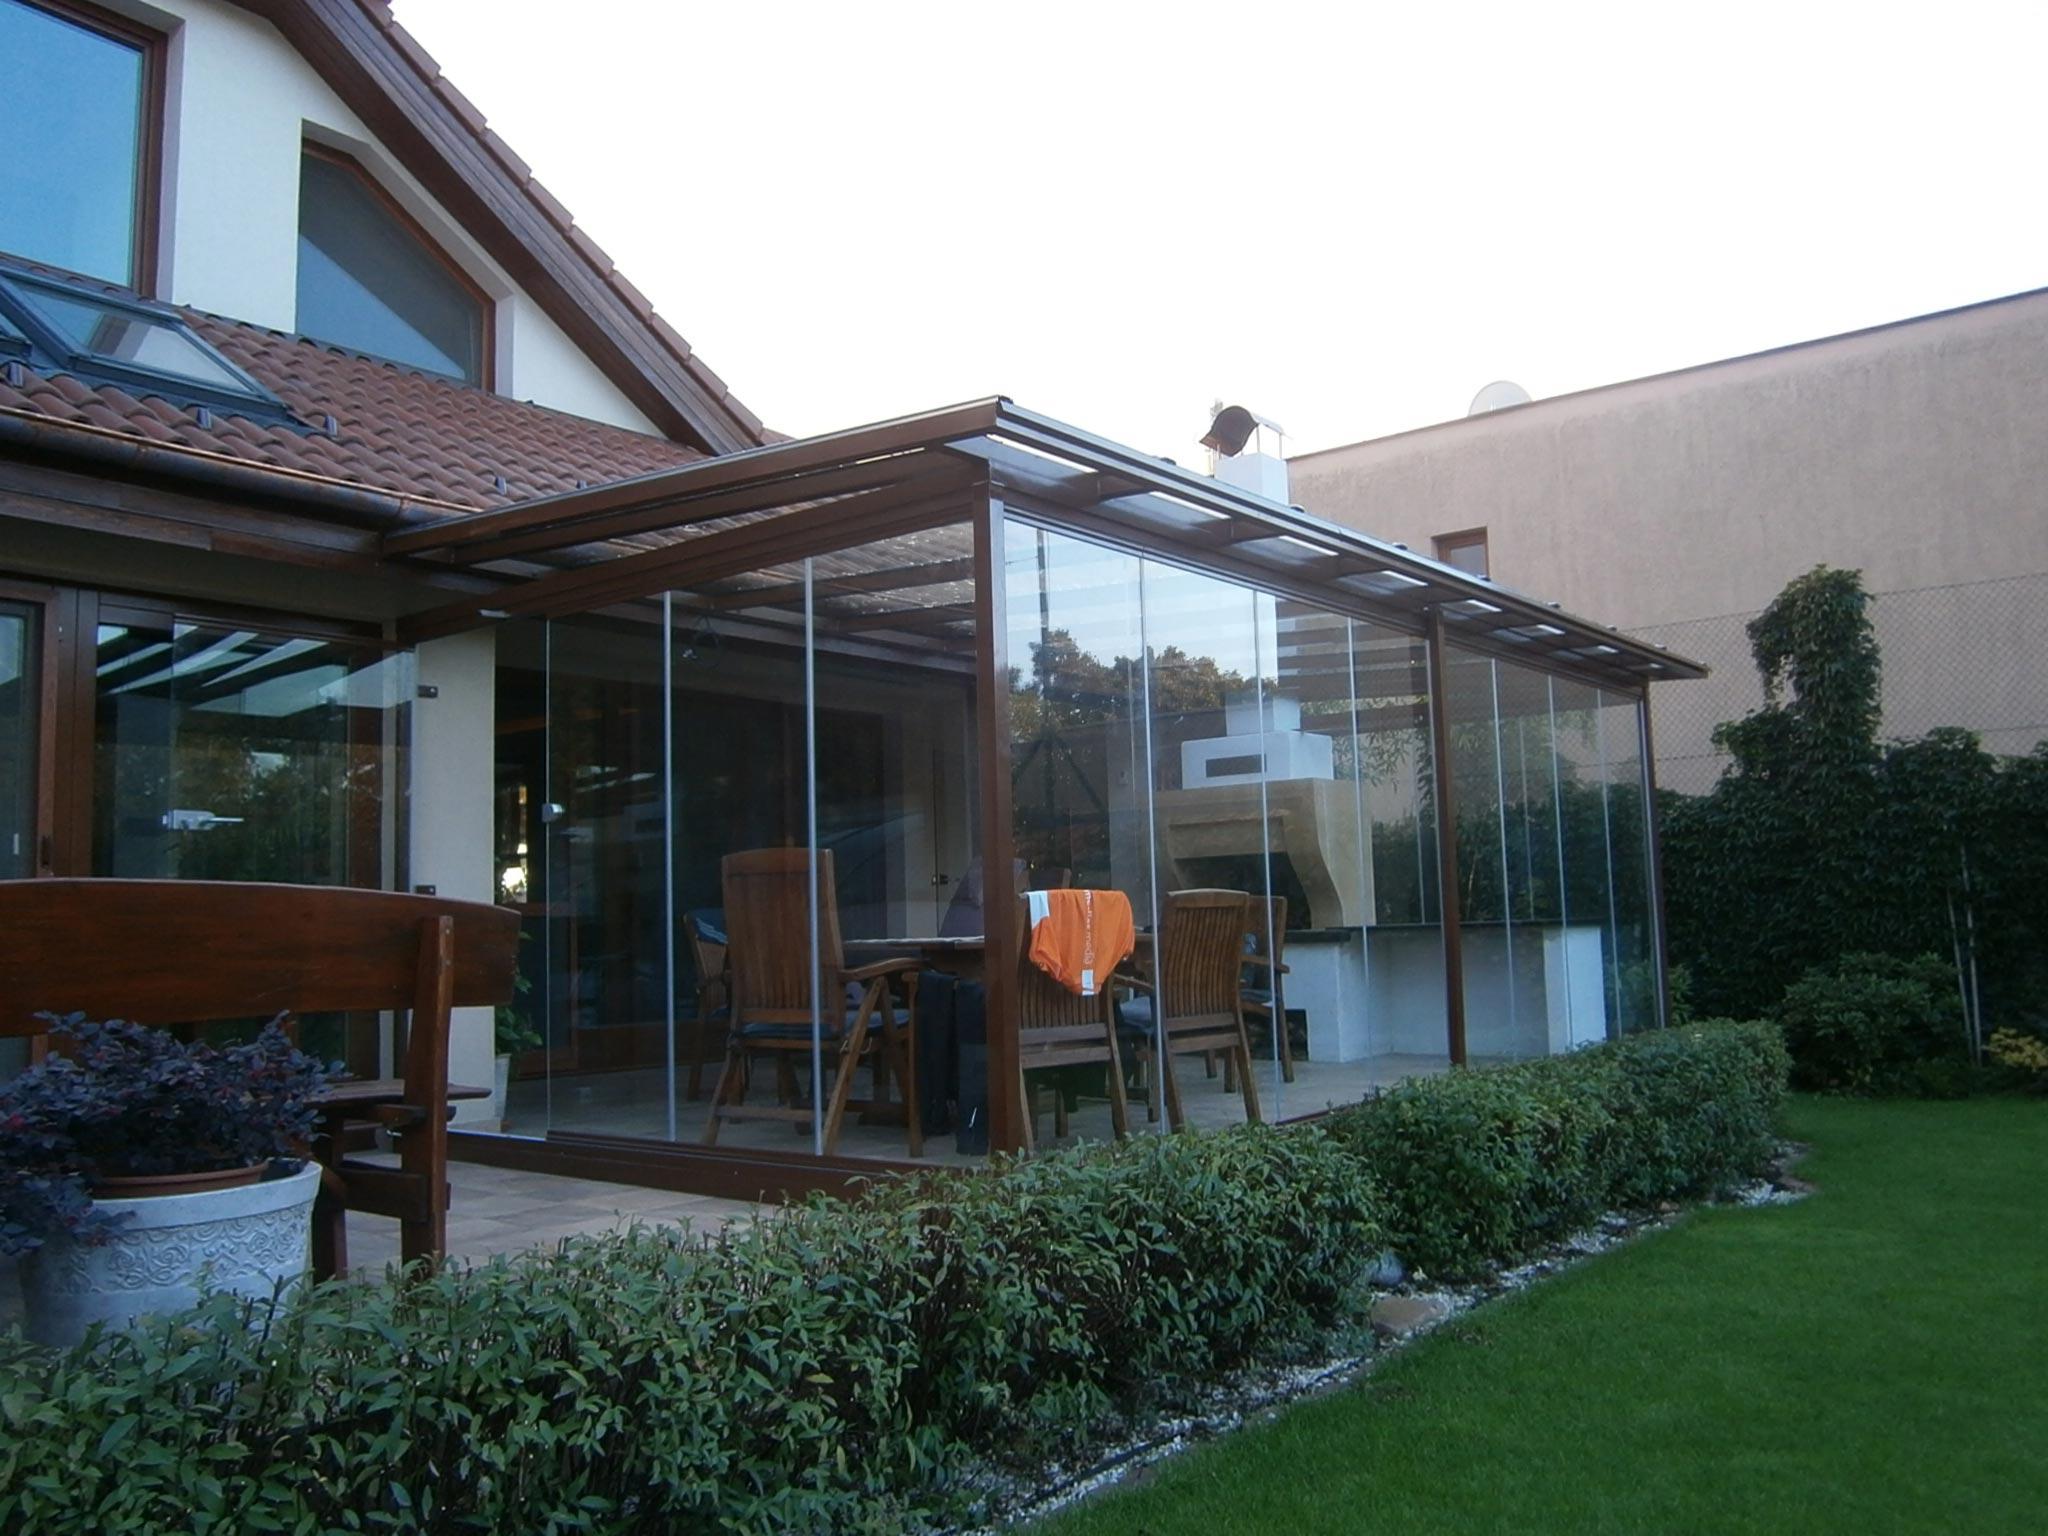 Cerramiento de cristal con pérgola en porche Eslovaquia